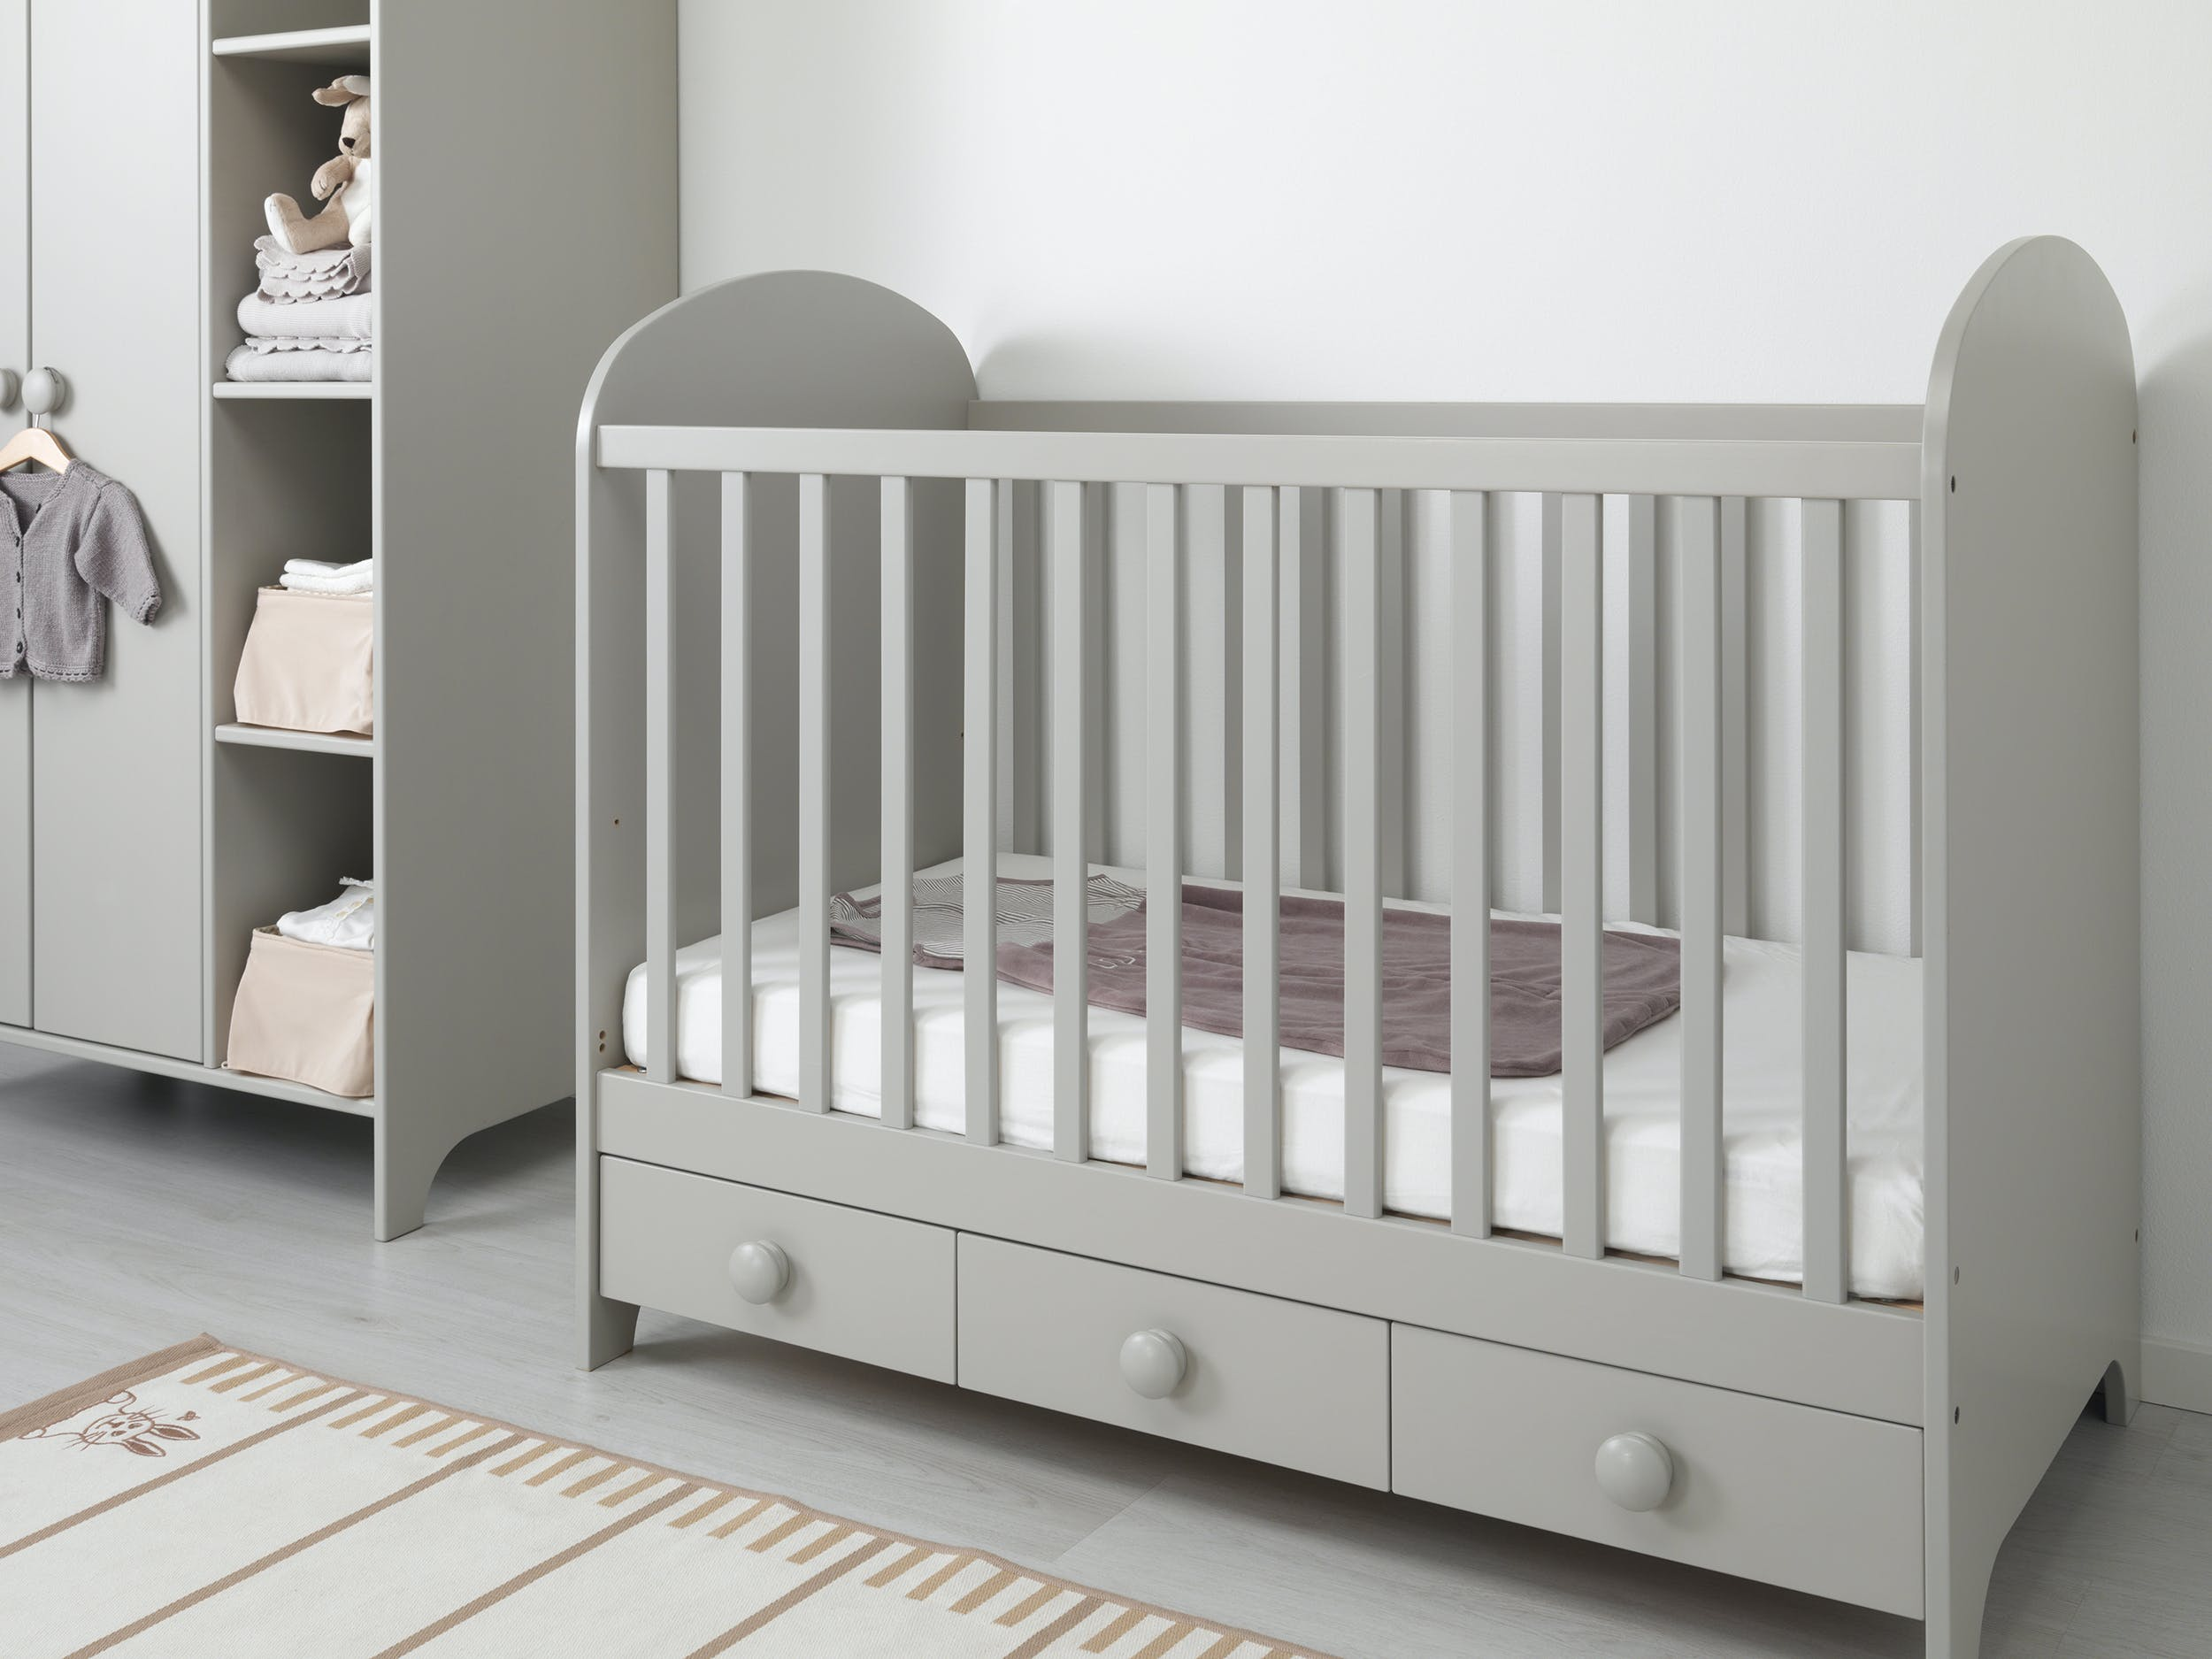 armoire bebe grise ikea